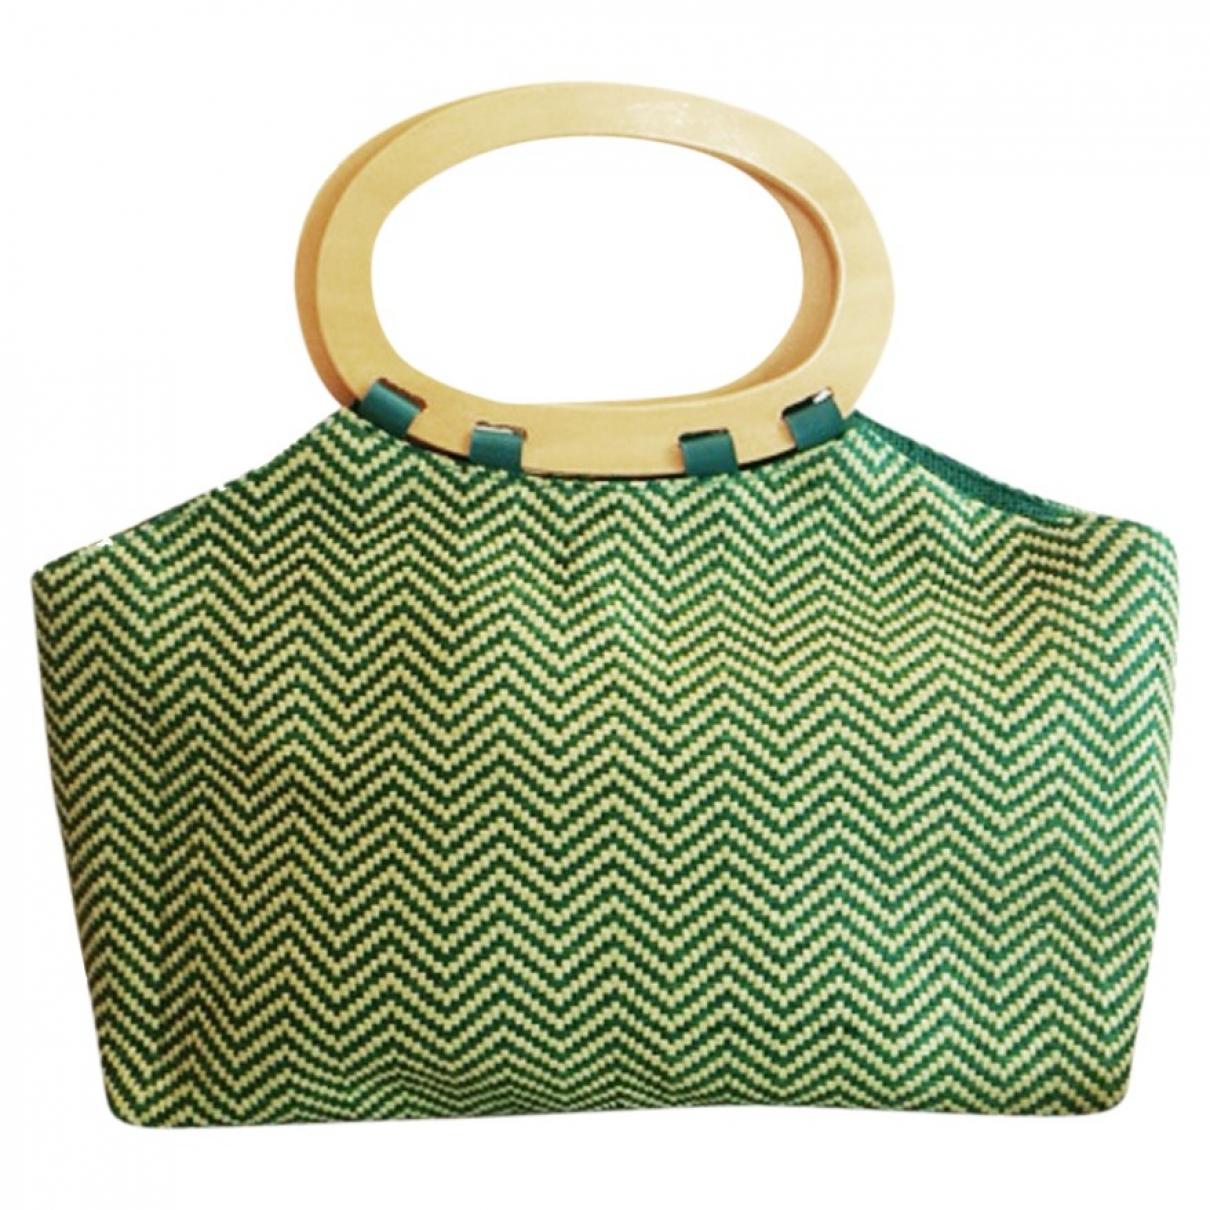 Marella \N Green Wicker handbag for Women \N